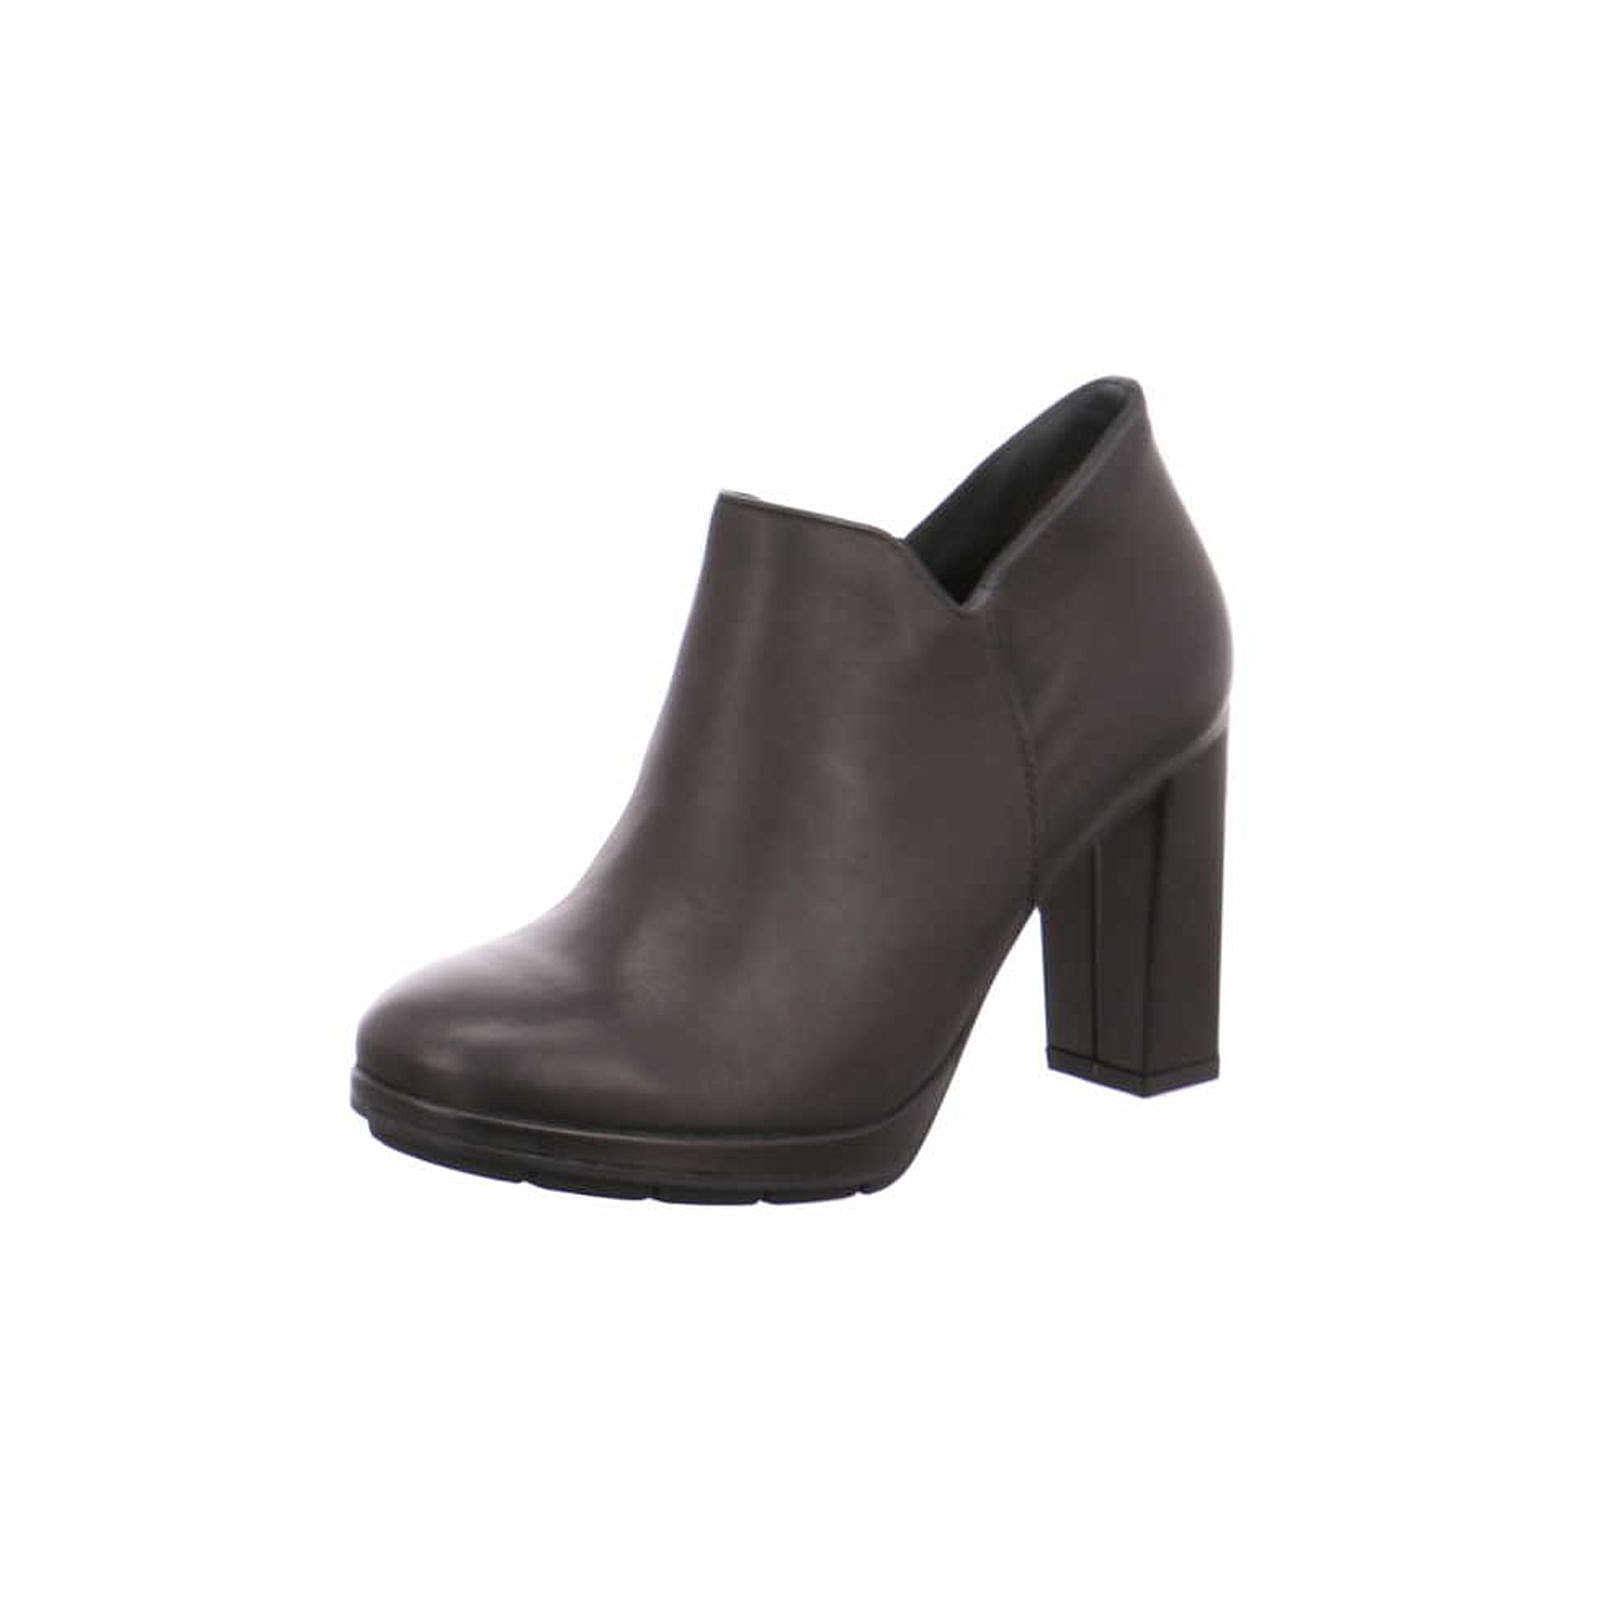 Paul Green Ankle Boots schwarz Damen Gr. 40